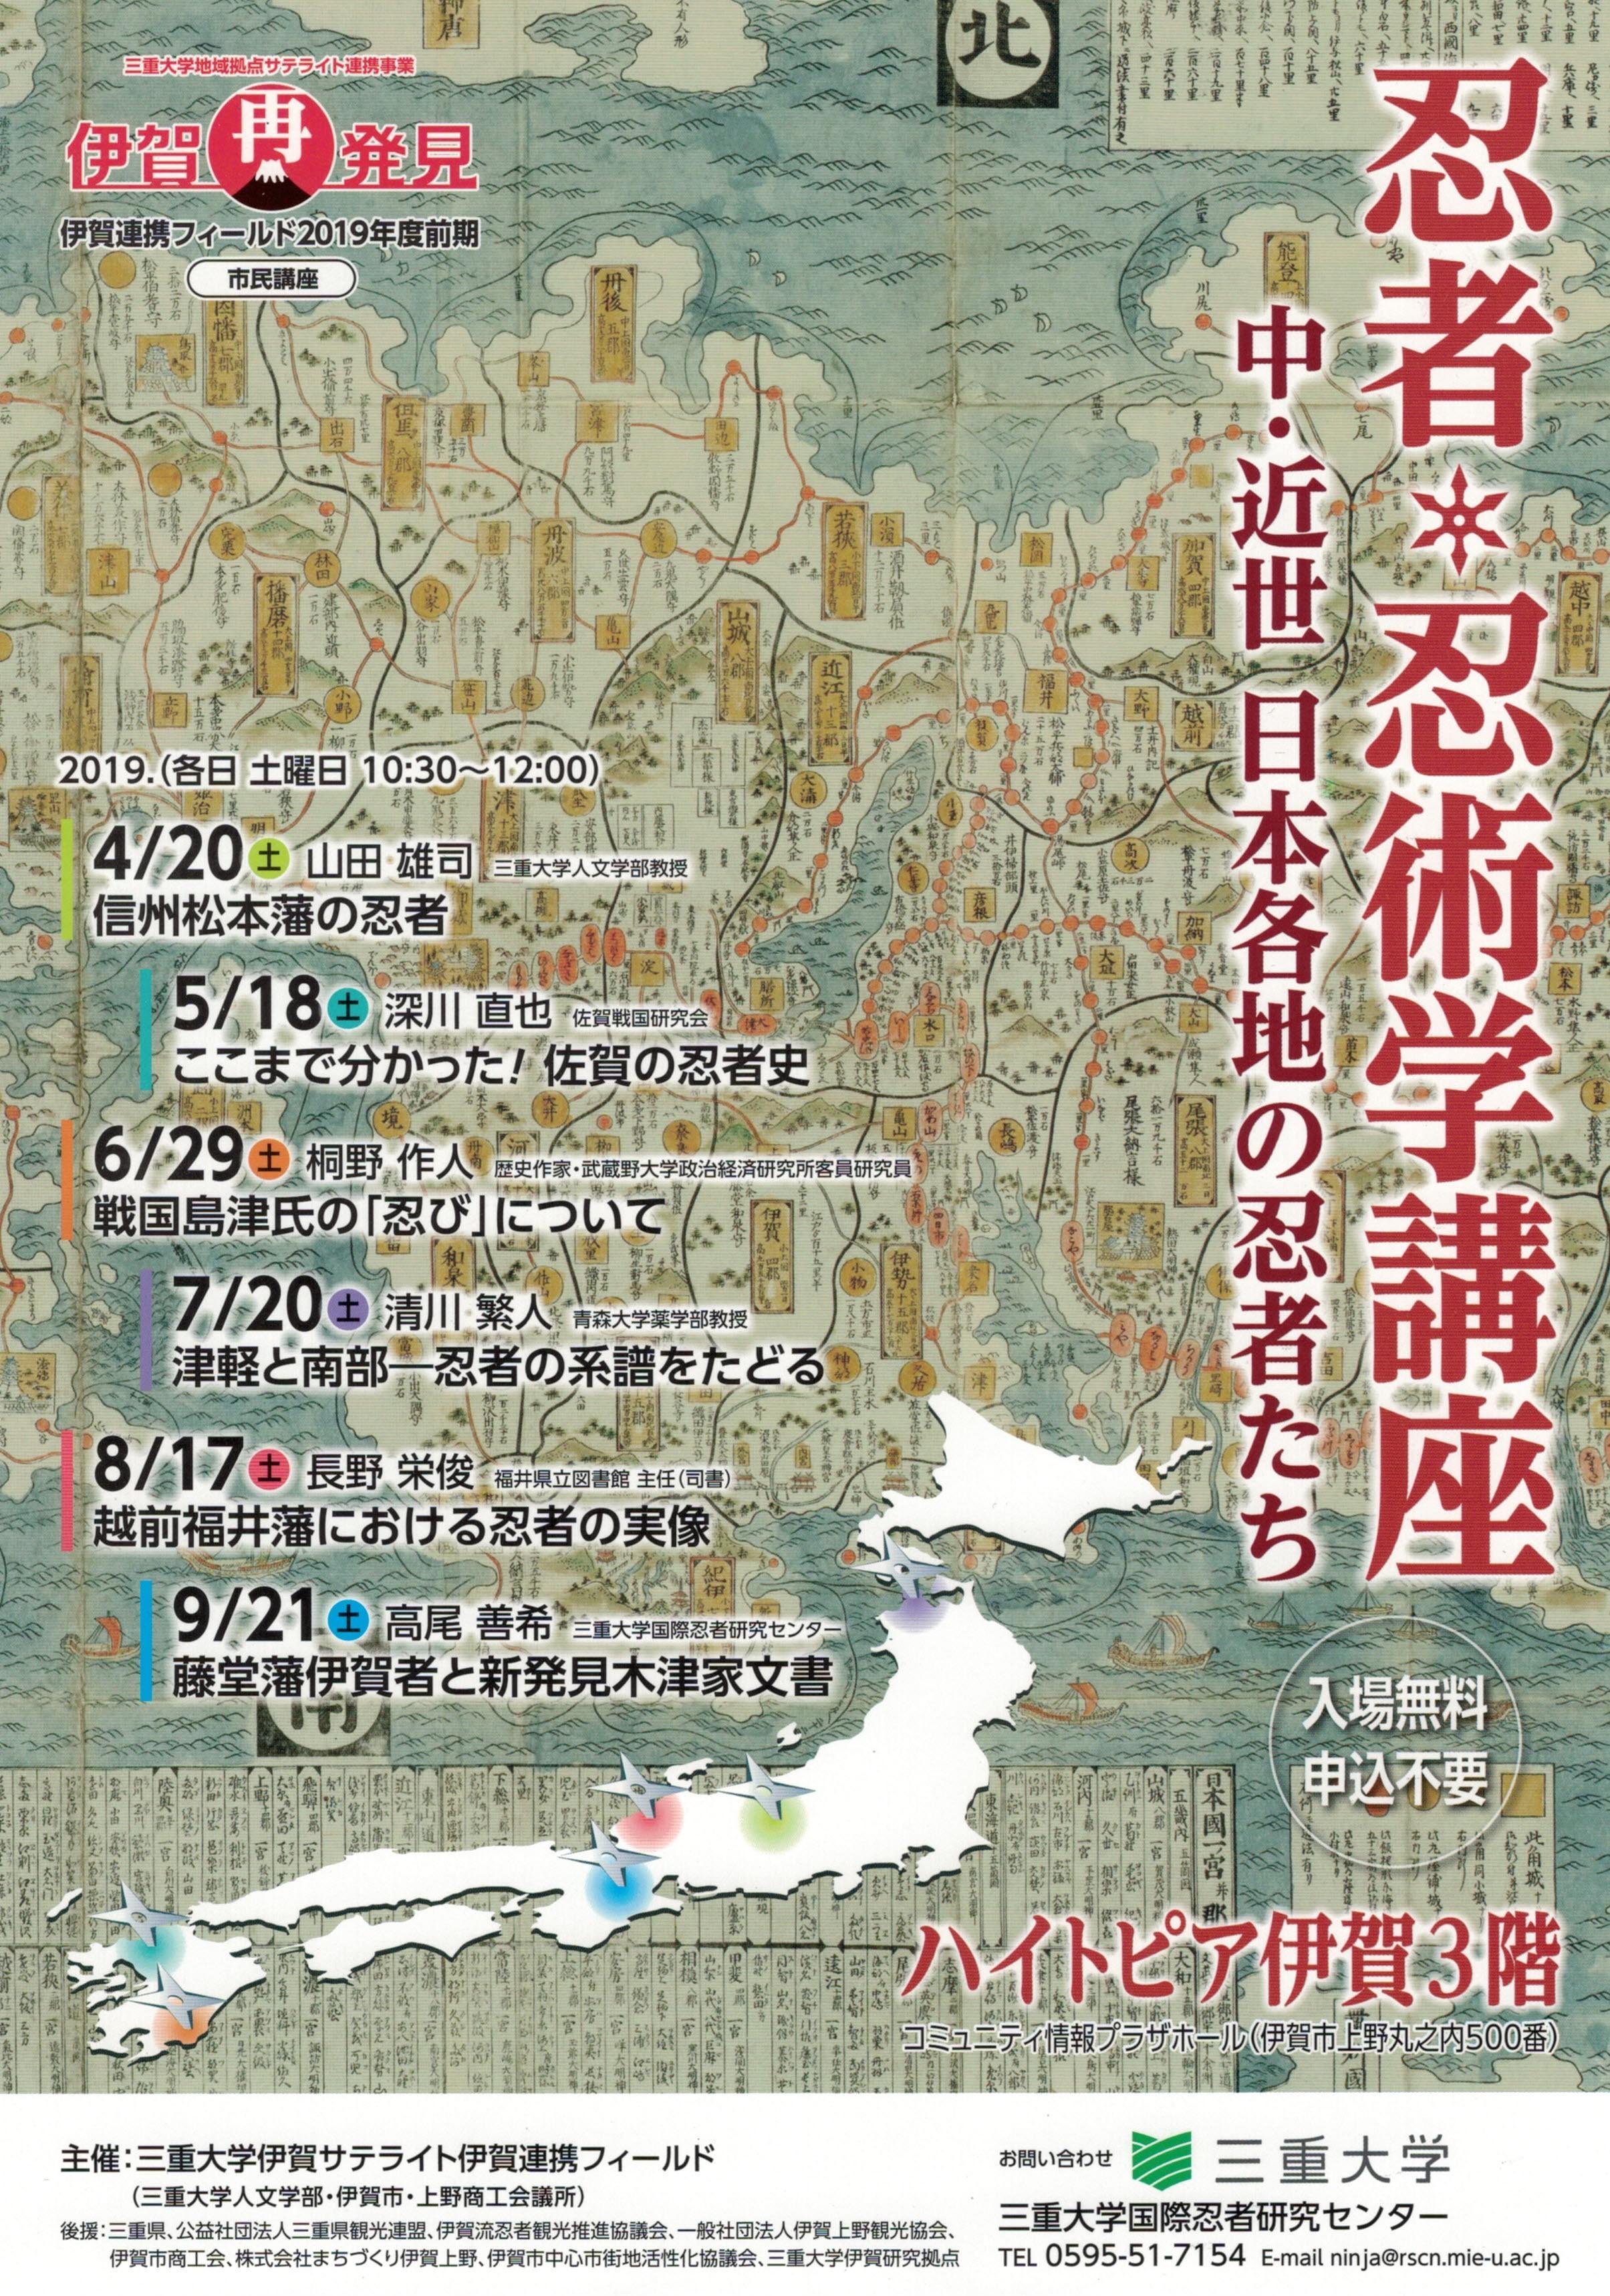 忍者忍術学講座2019チラシ.jpg